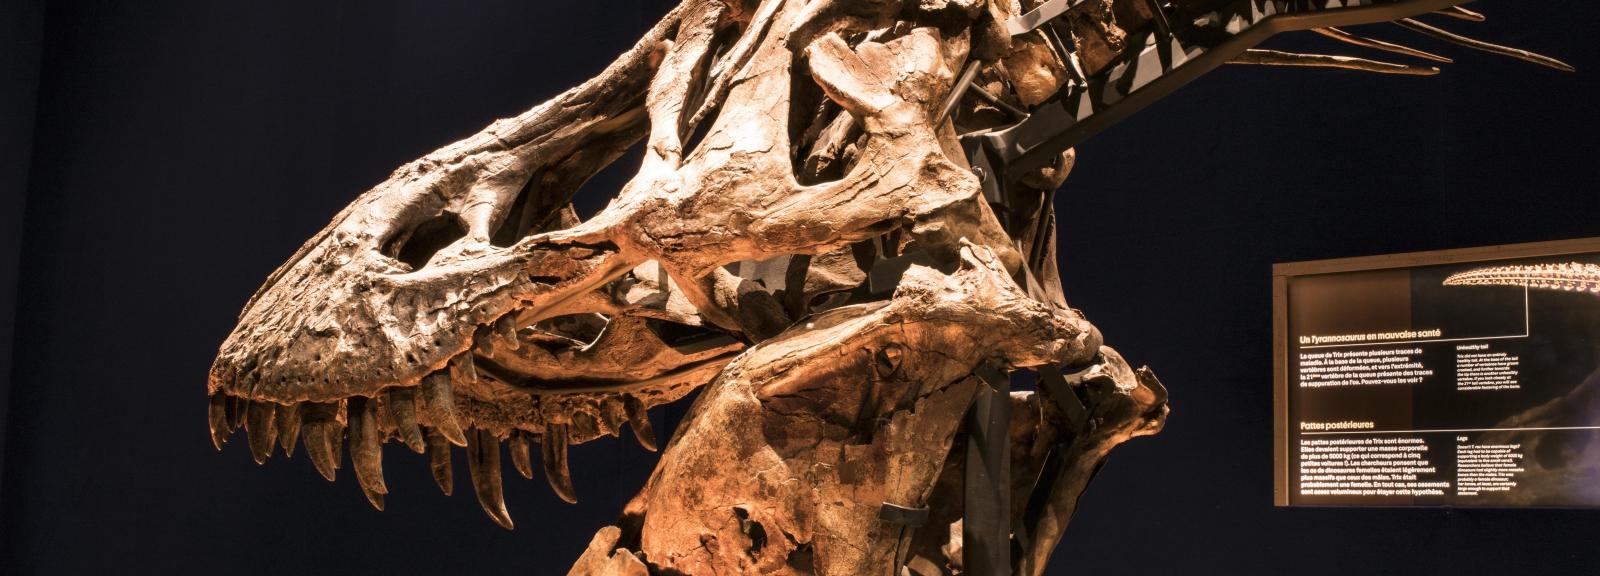 Exposition Un T. rex, Trix - © MNHN - A. Iatzoura